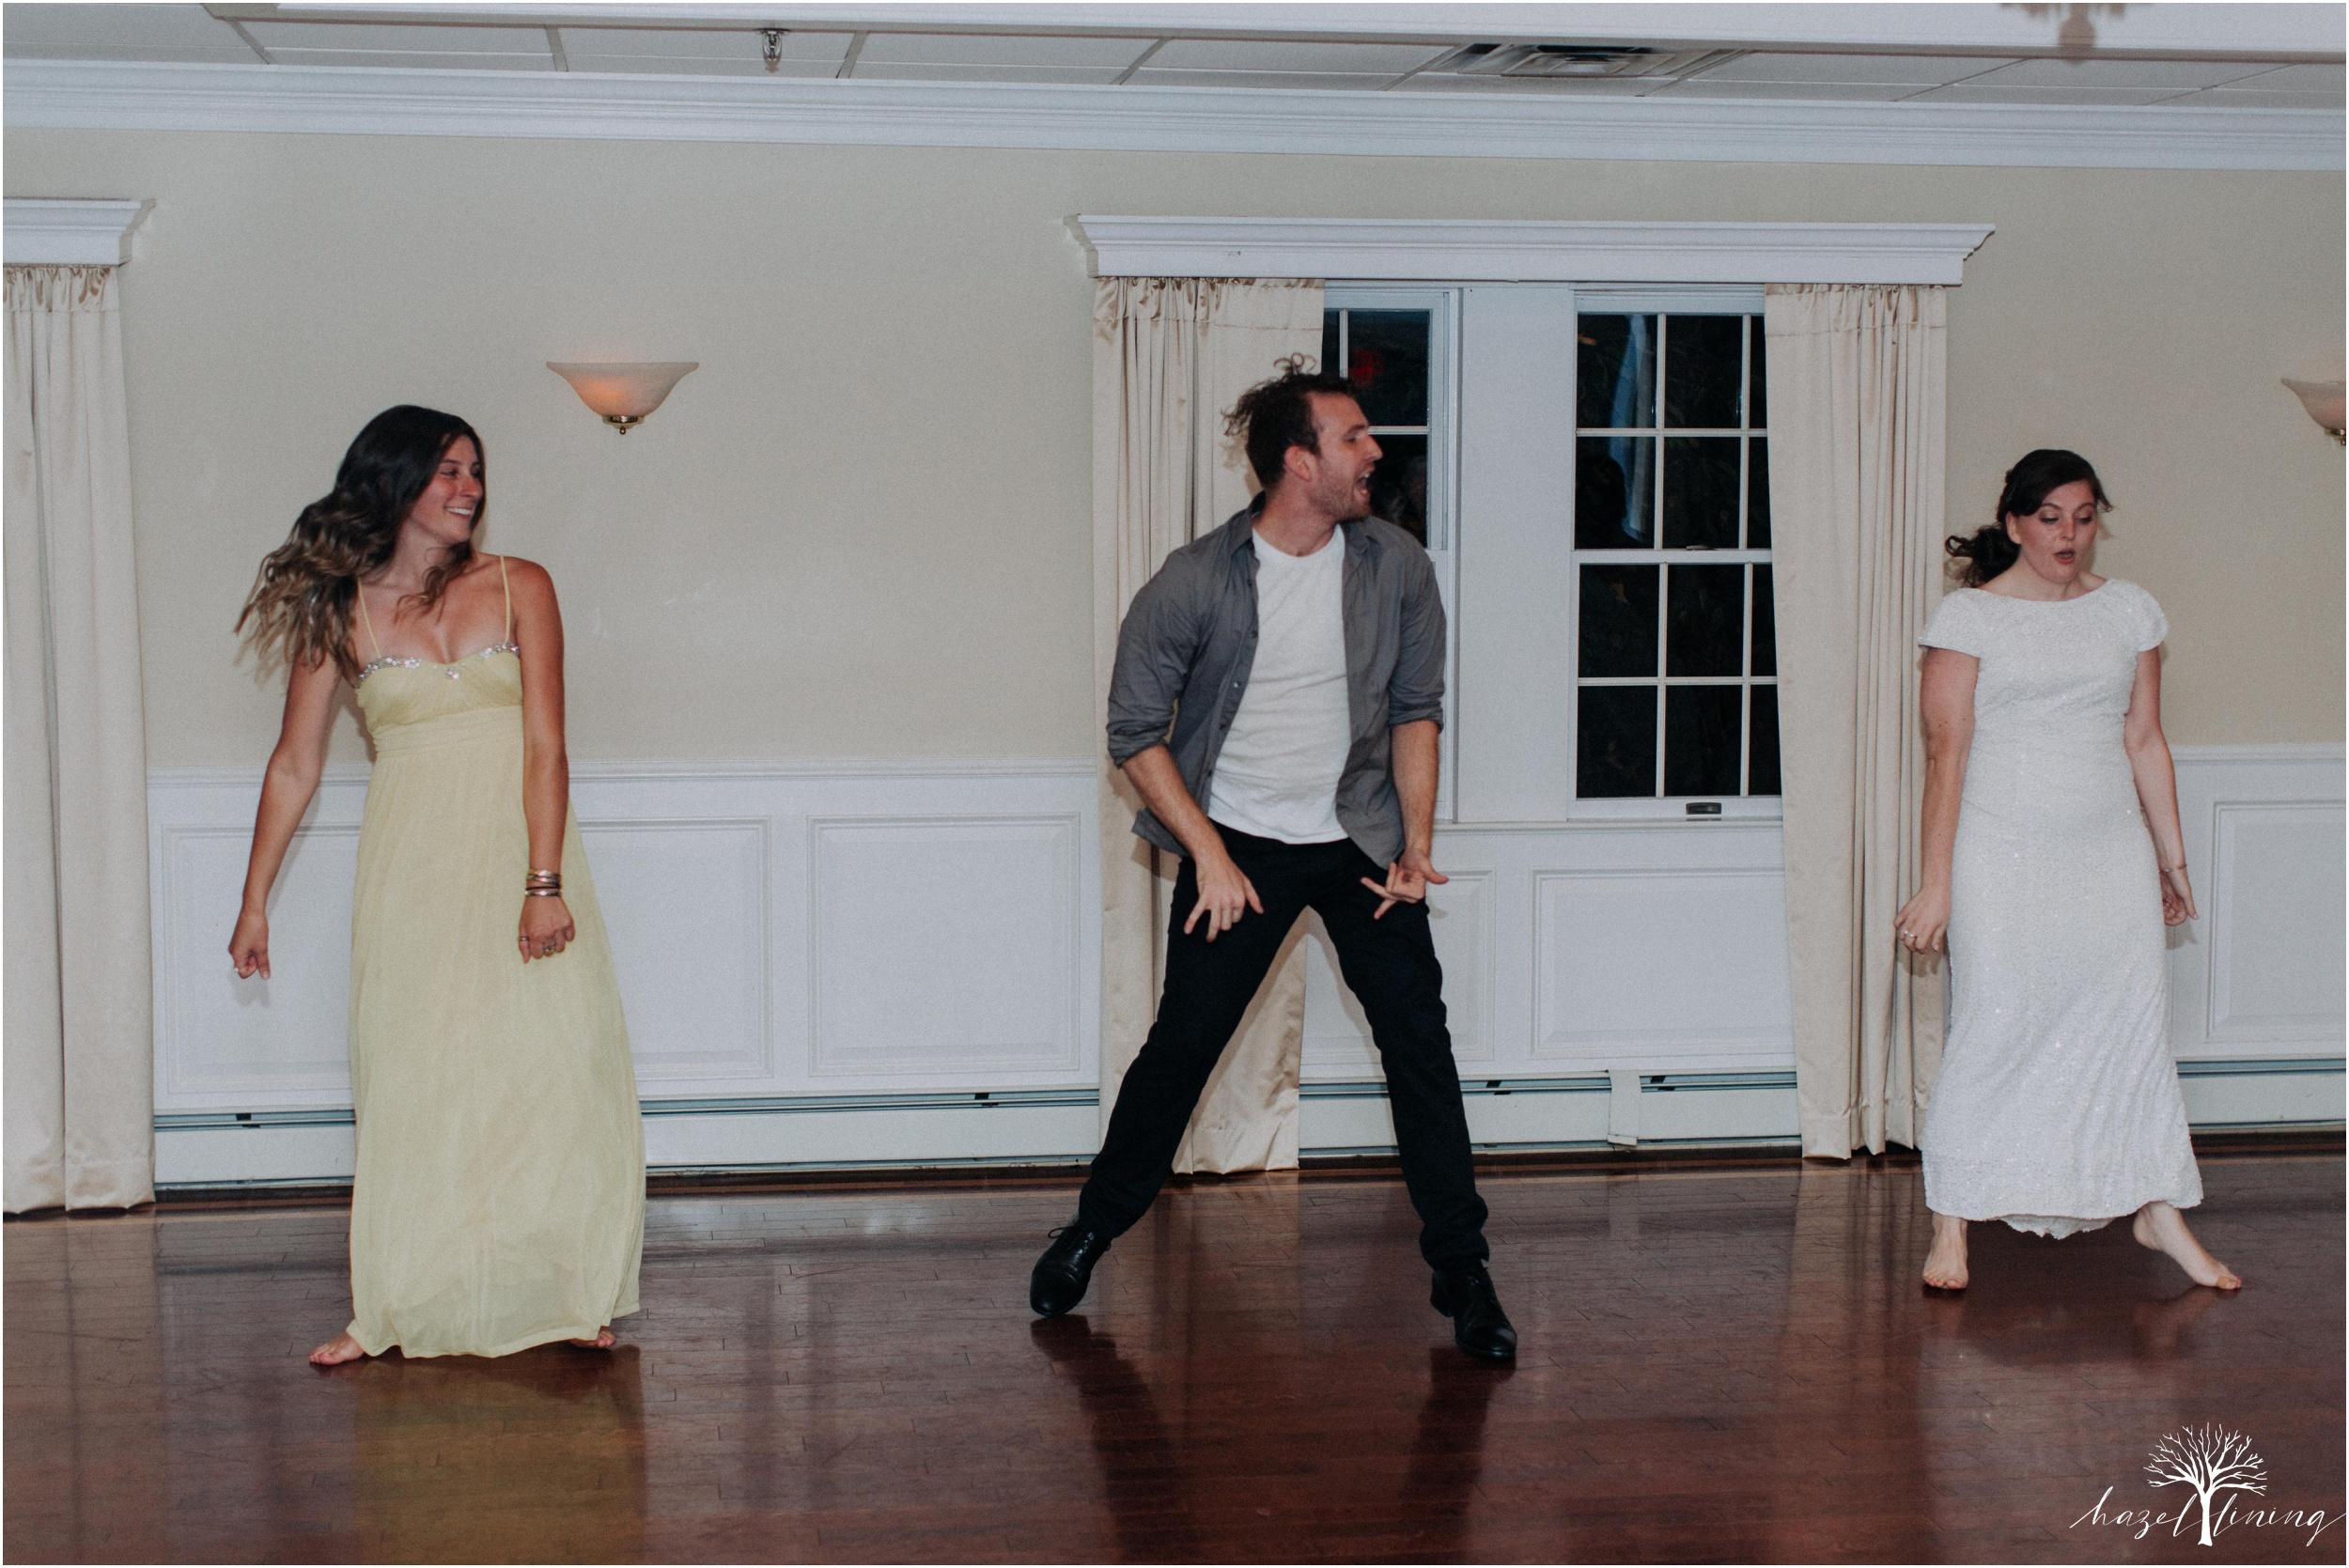 elizabeth-doelp-andrew-foreback-middletown-country-club-summer-langhorne-pennsylvania-wedding-hazel-lining-travel-wedding-elopement-photography_0167.jpg